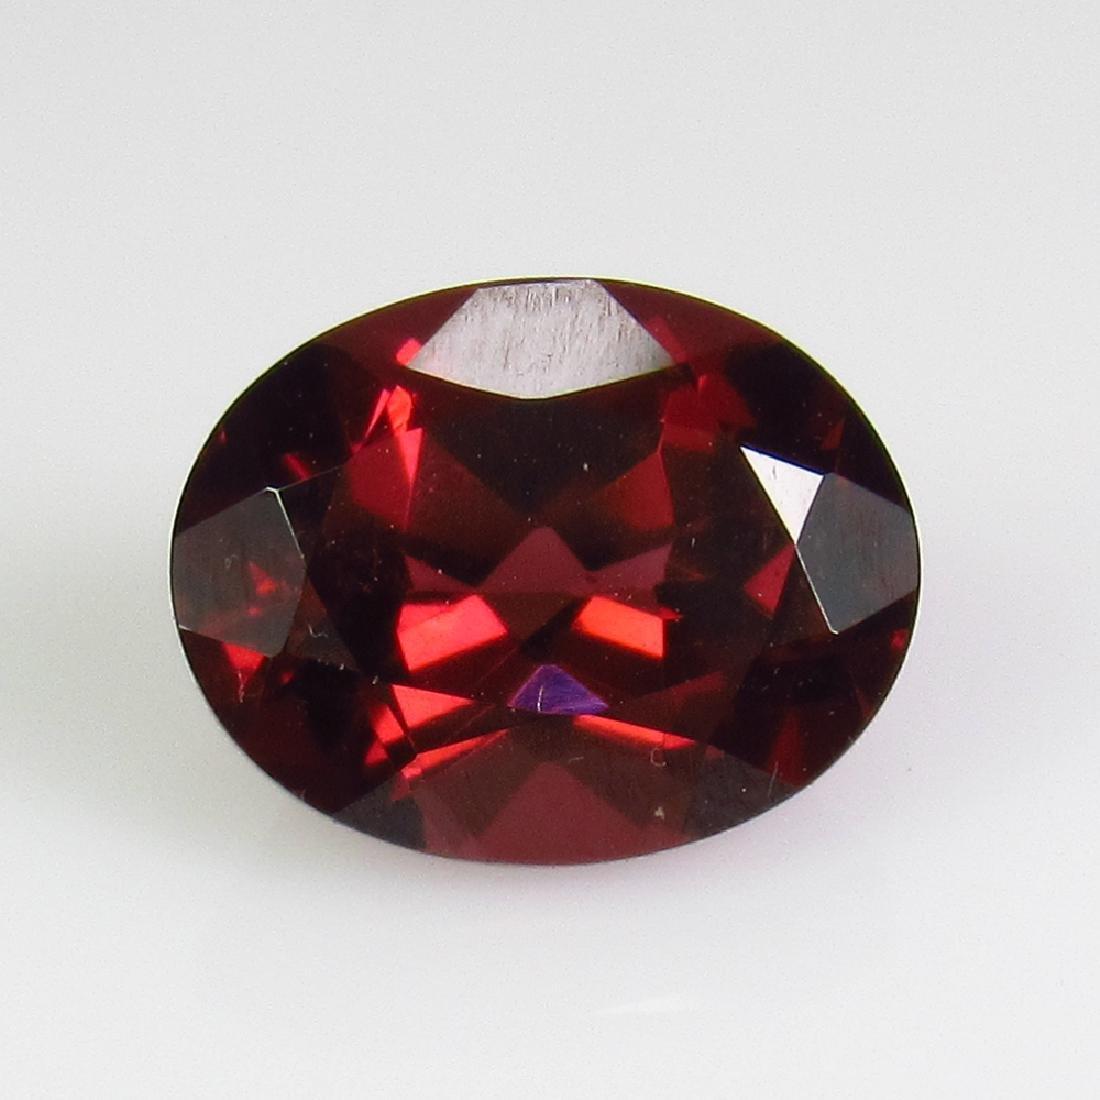 2.76 Ct Genuine Pink Rhodolite Garnet Oval Cut